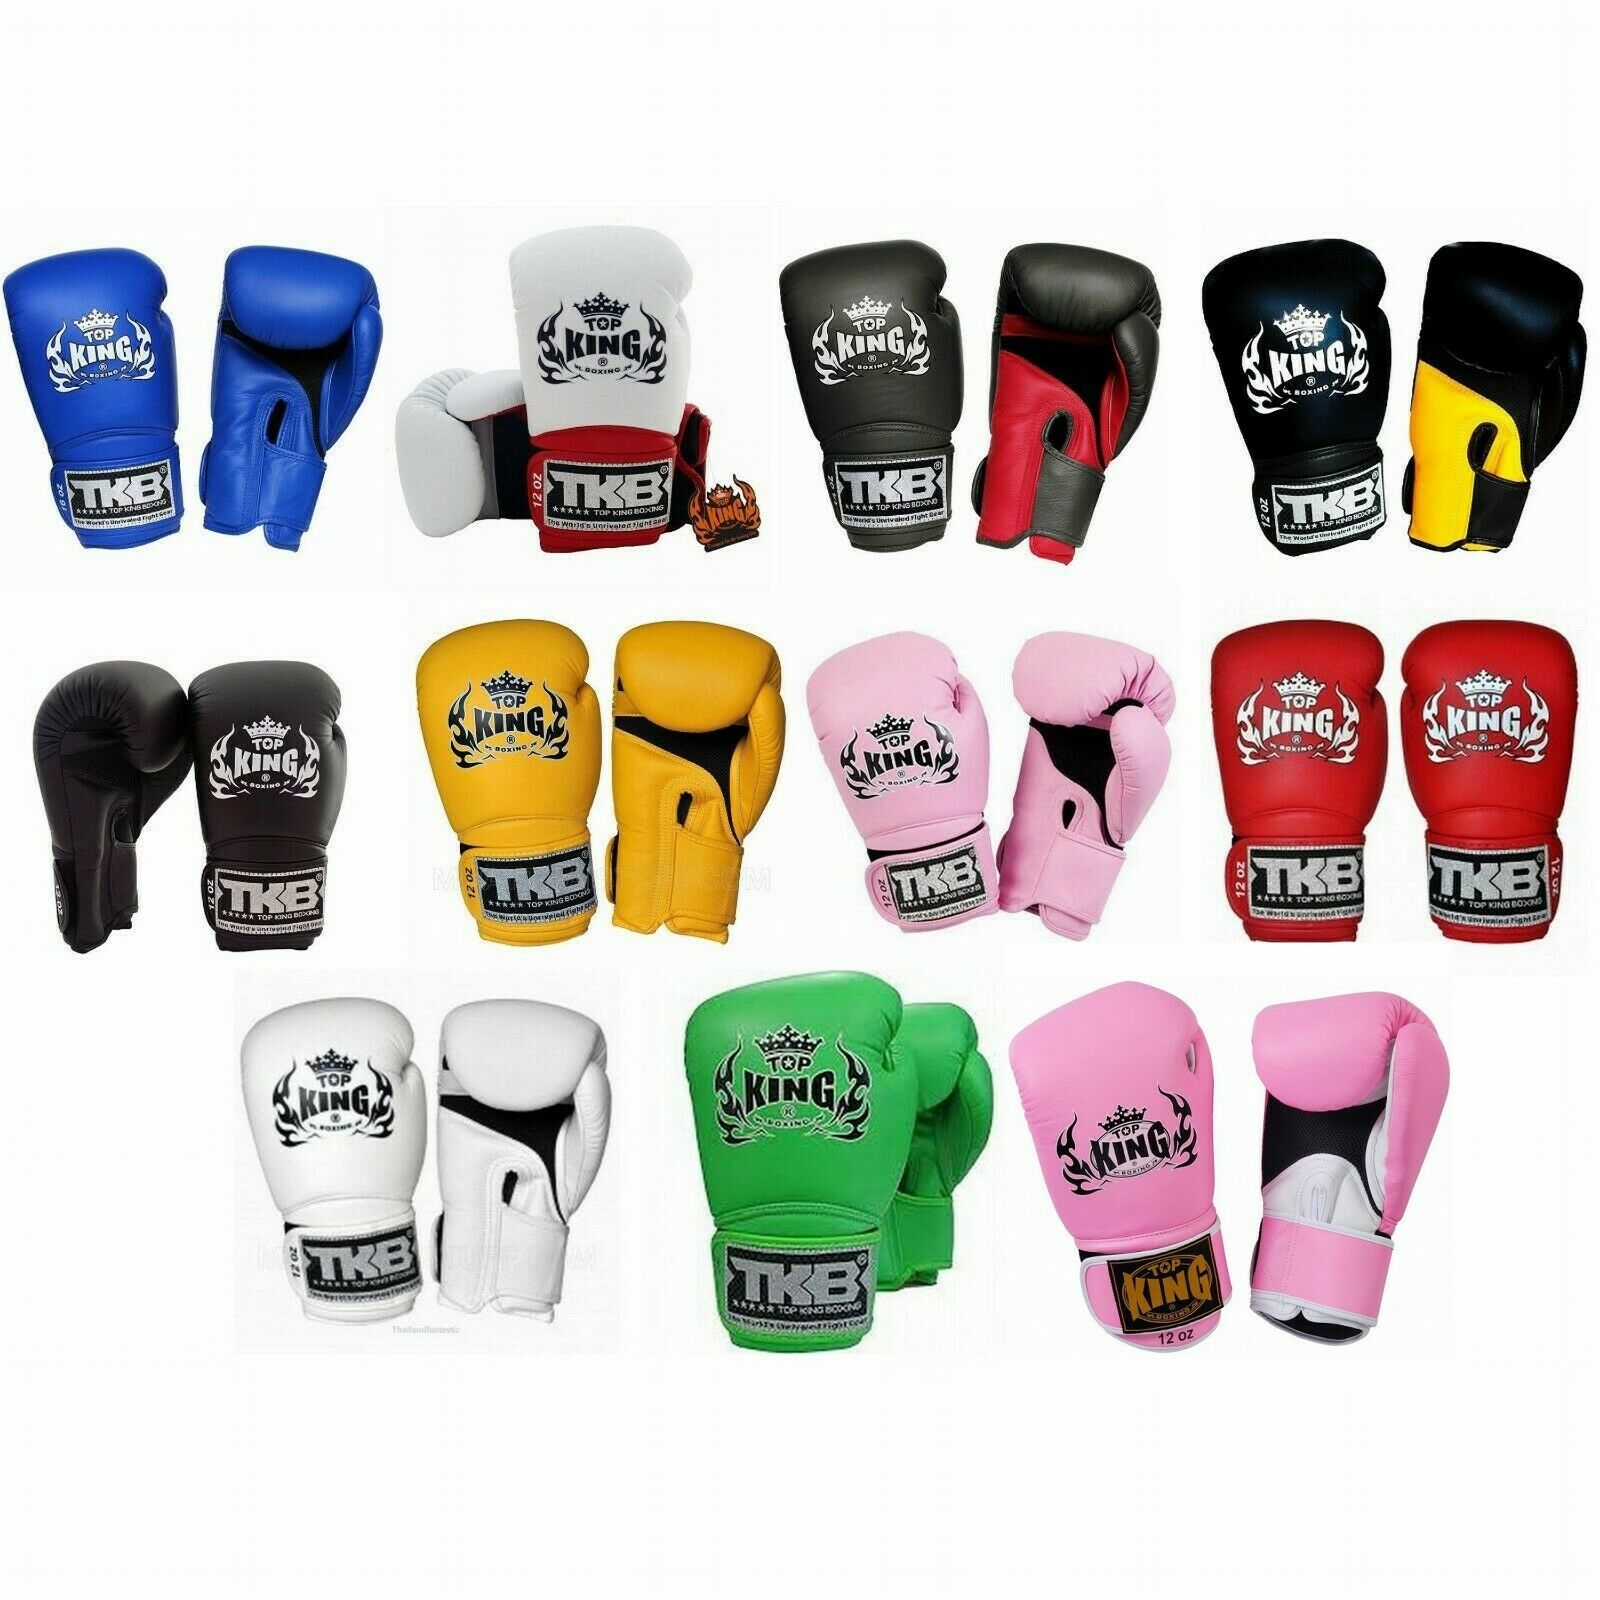 NWT TOP KING TKBGSA Super Star Air Velcro Martial Arts Muay Thai Boxhandschuhe